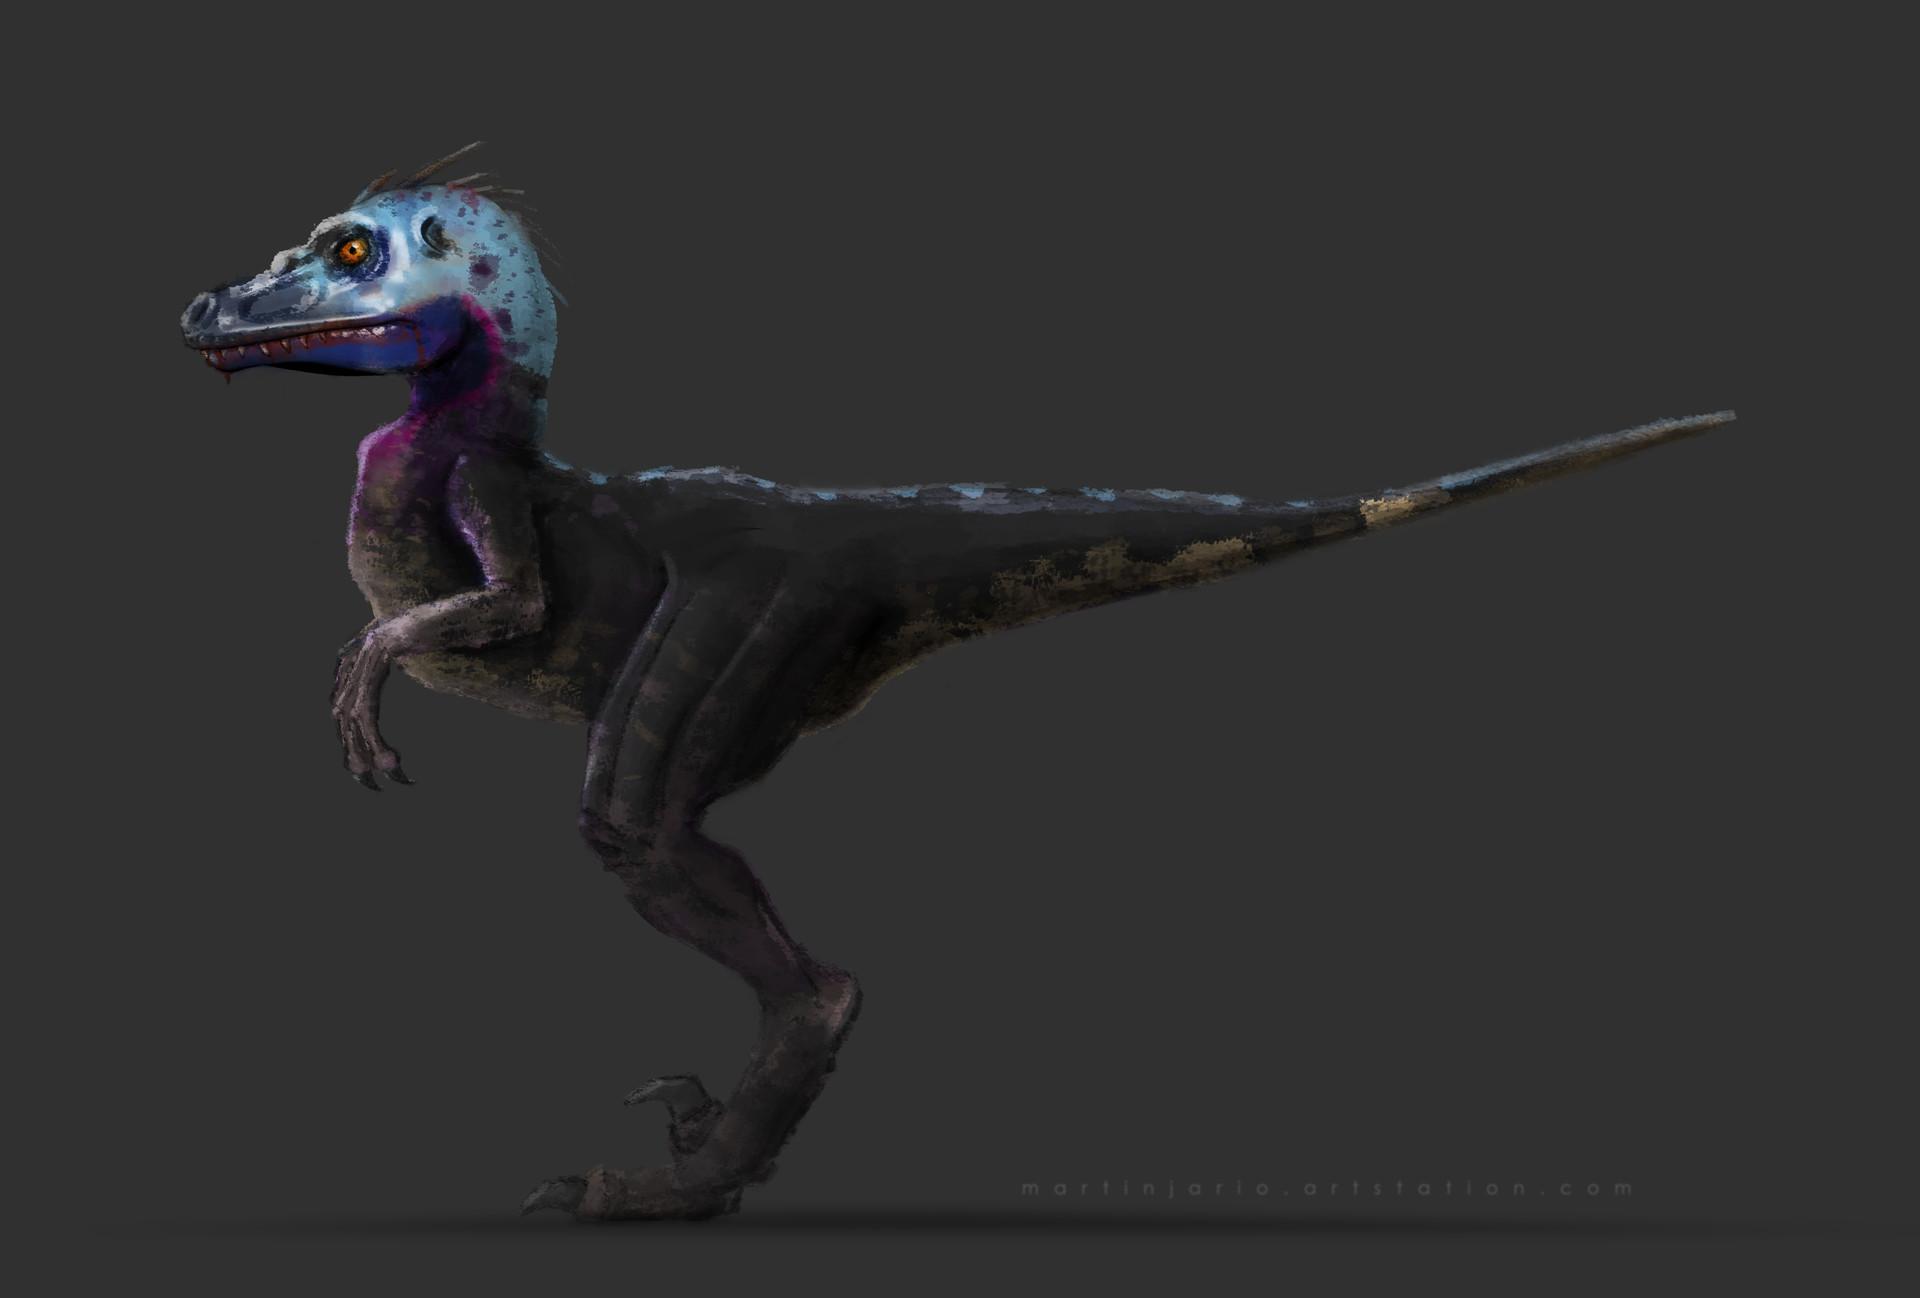 Martin jario martinjario velociraptor 02